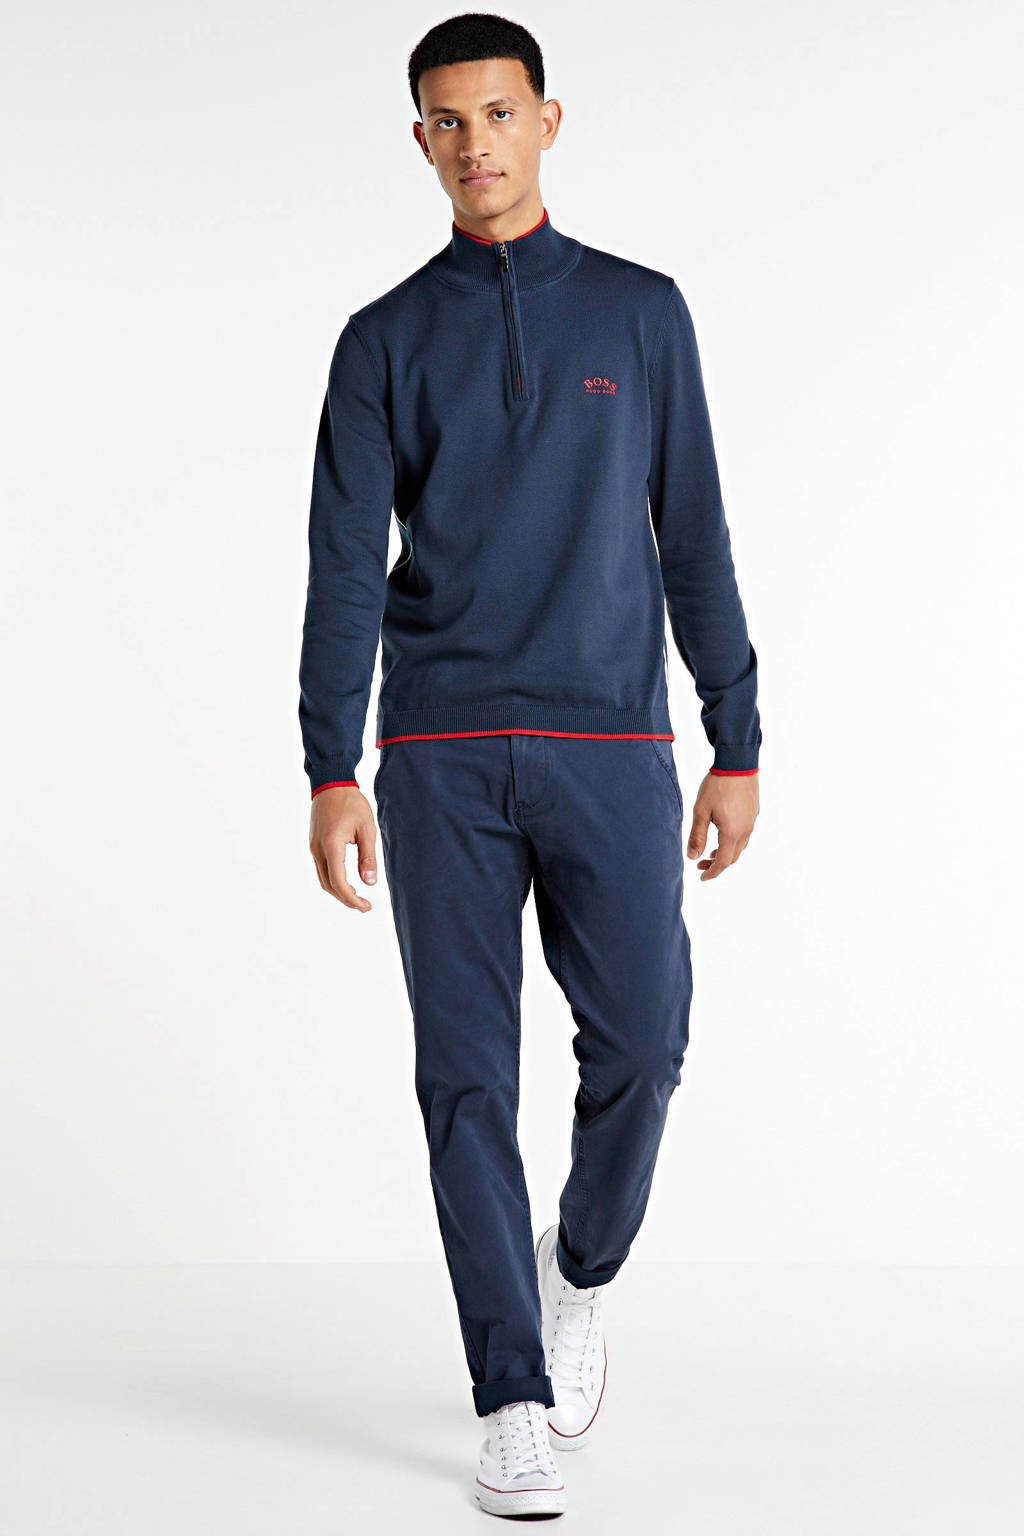 BOSS Athleisure Big & Tall trui donkerblauw/rood, Donkerblauw/rood